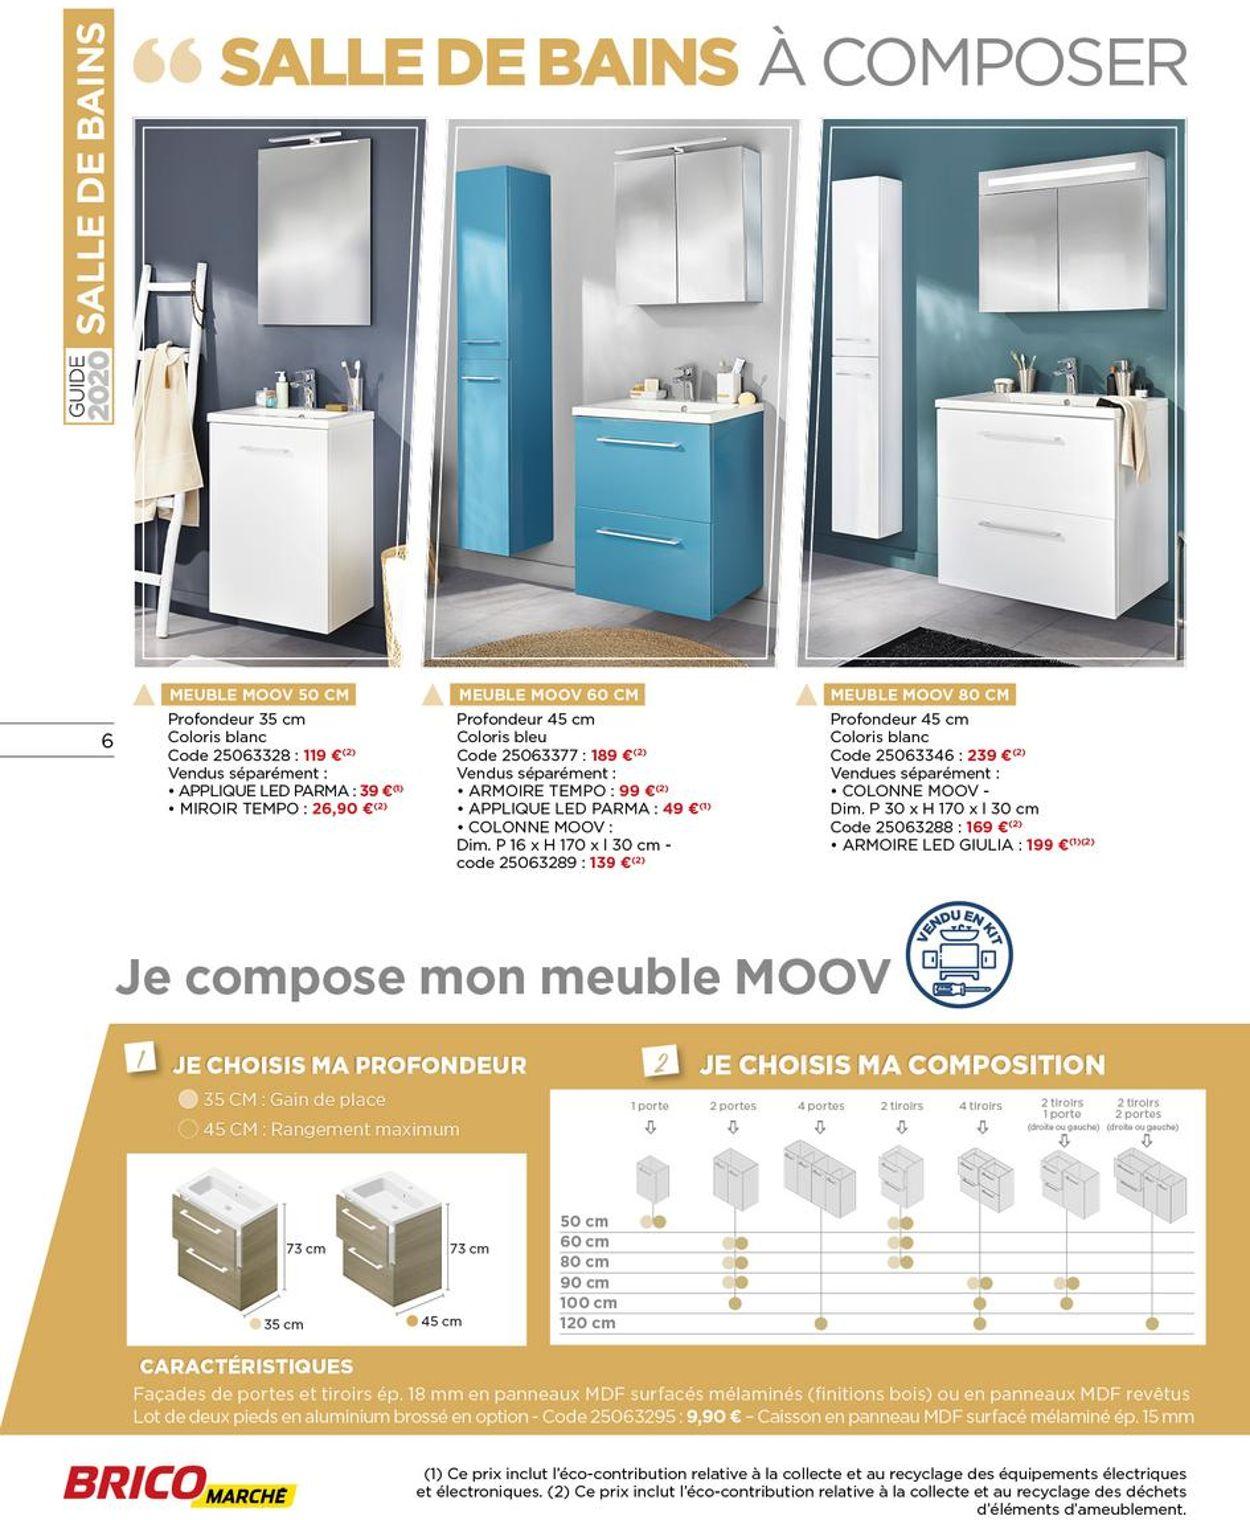 Bricomarché Catalogue - 05.02-28.03.2020 (Page 6)